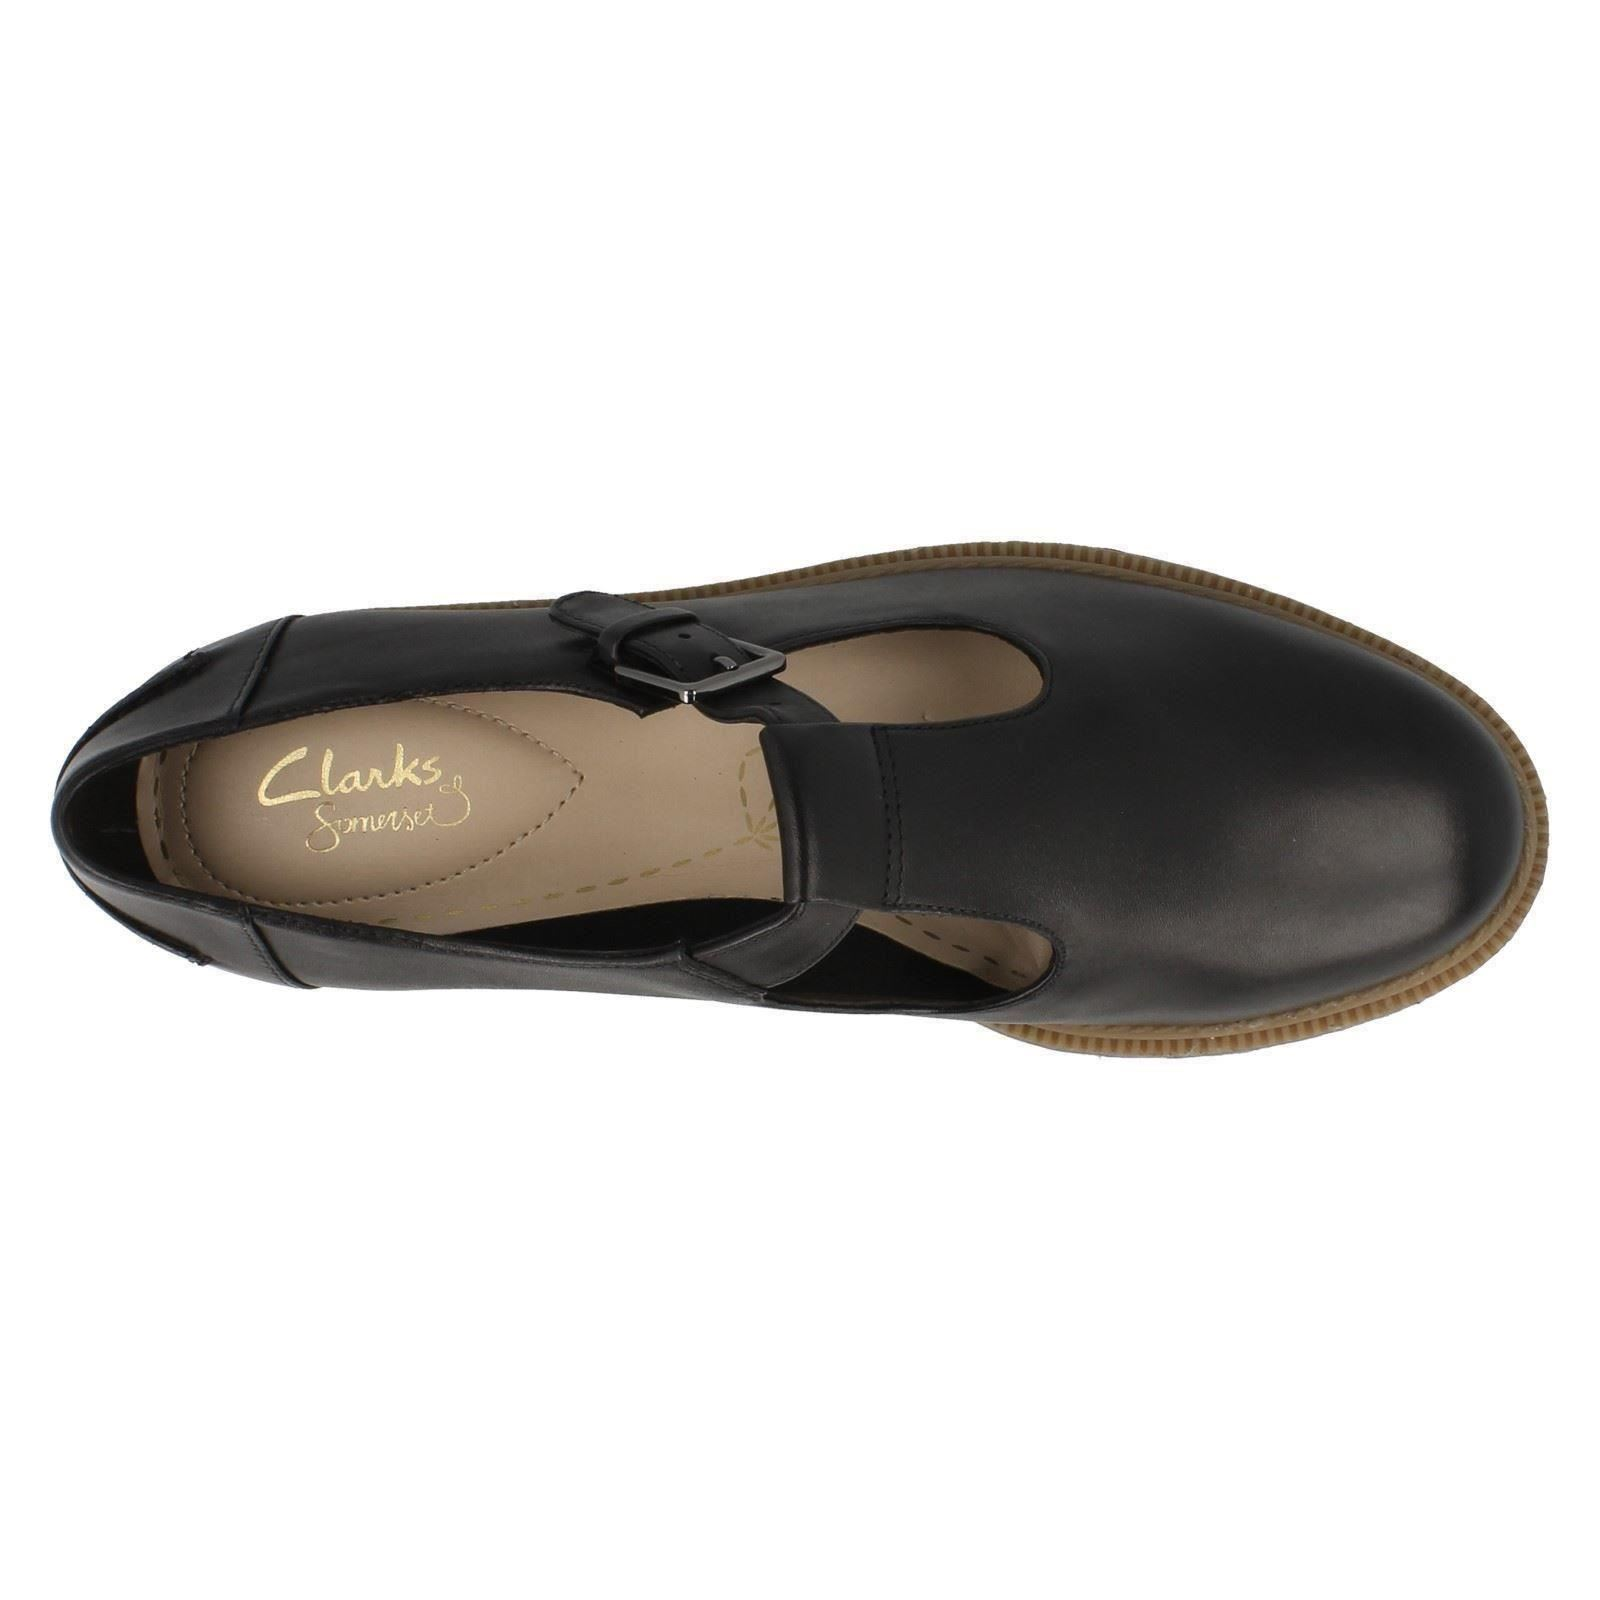 Clarks Flat Suede Blue Shoes